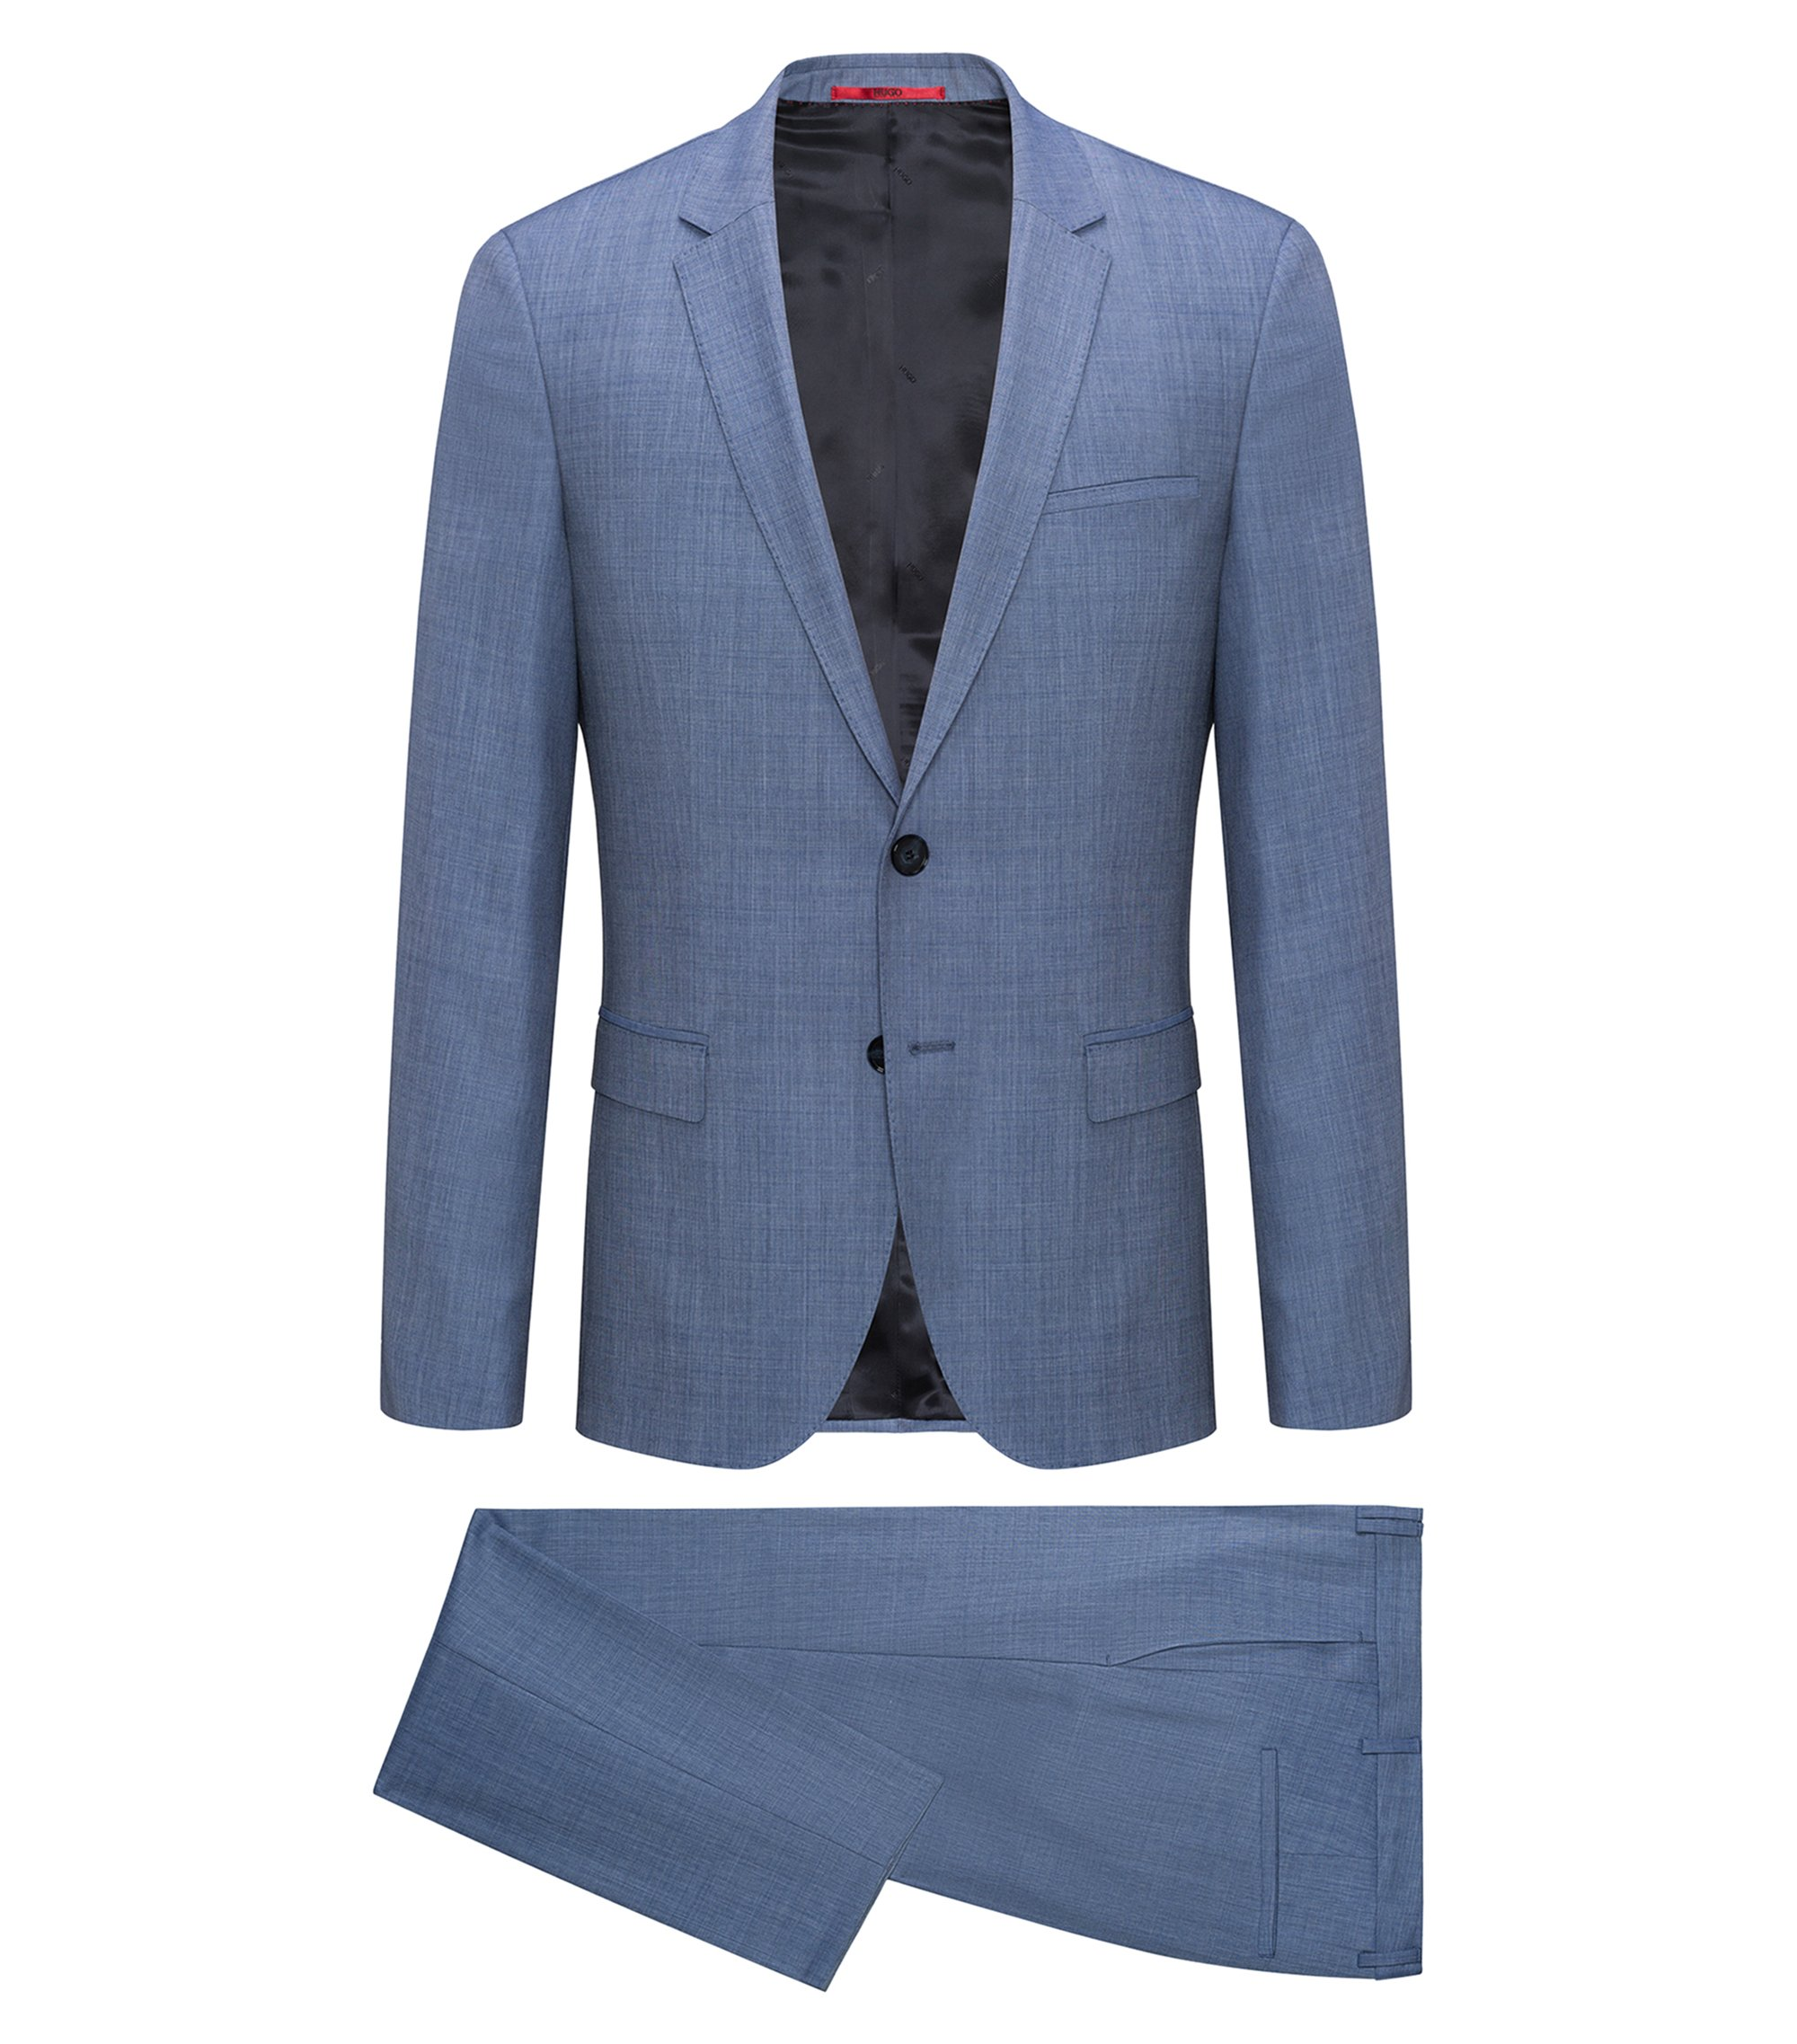 Extra-slim-fit suit in melange virgin wool twill, Turquoise